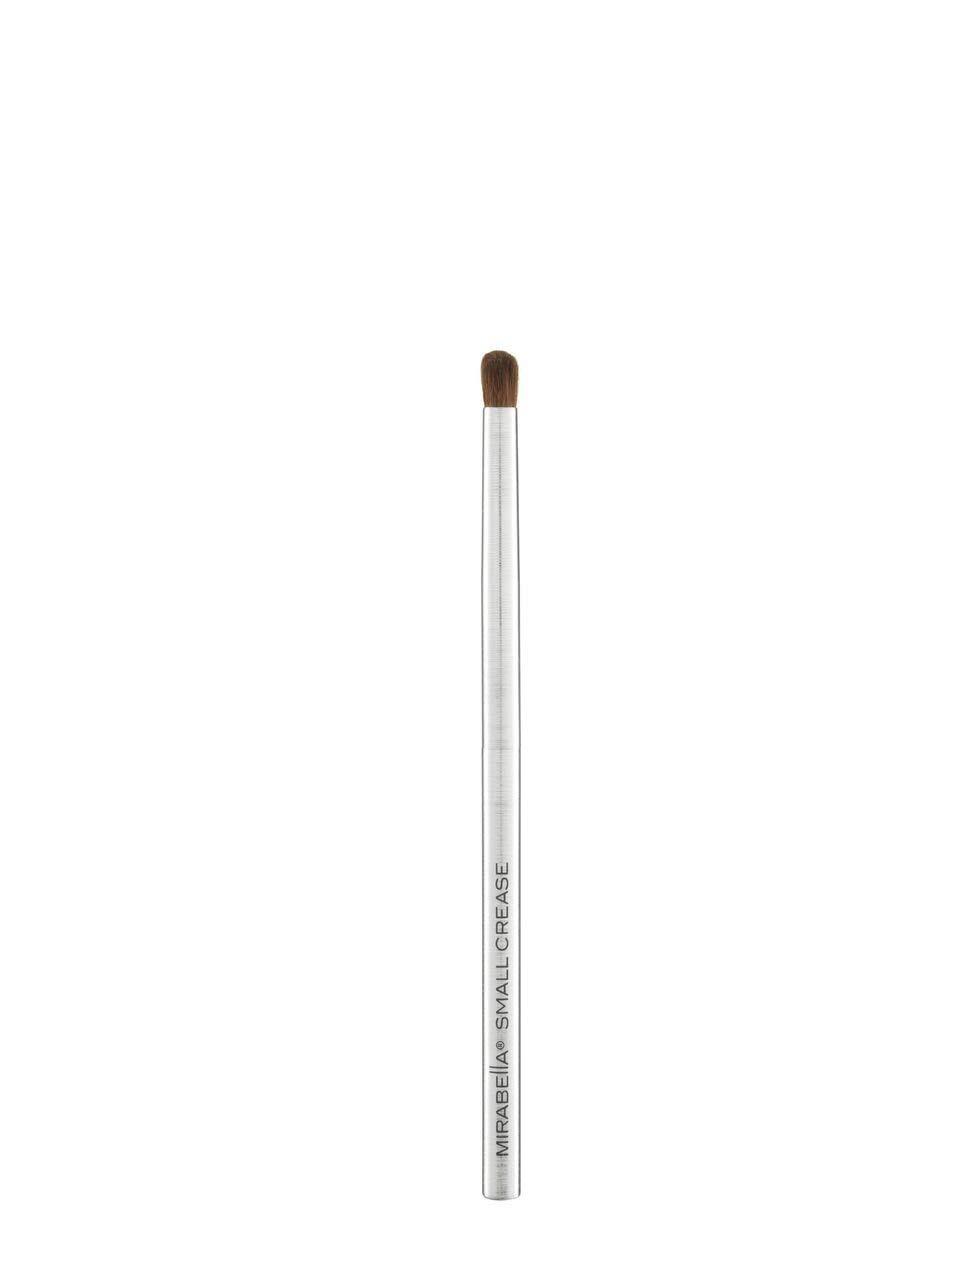 Mirabella Hand-Sculpted Luxury Brush - Small Crease Brush